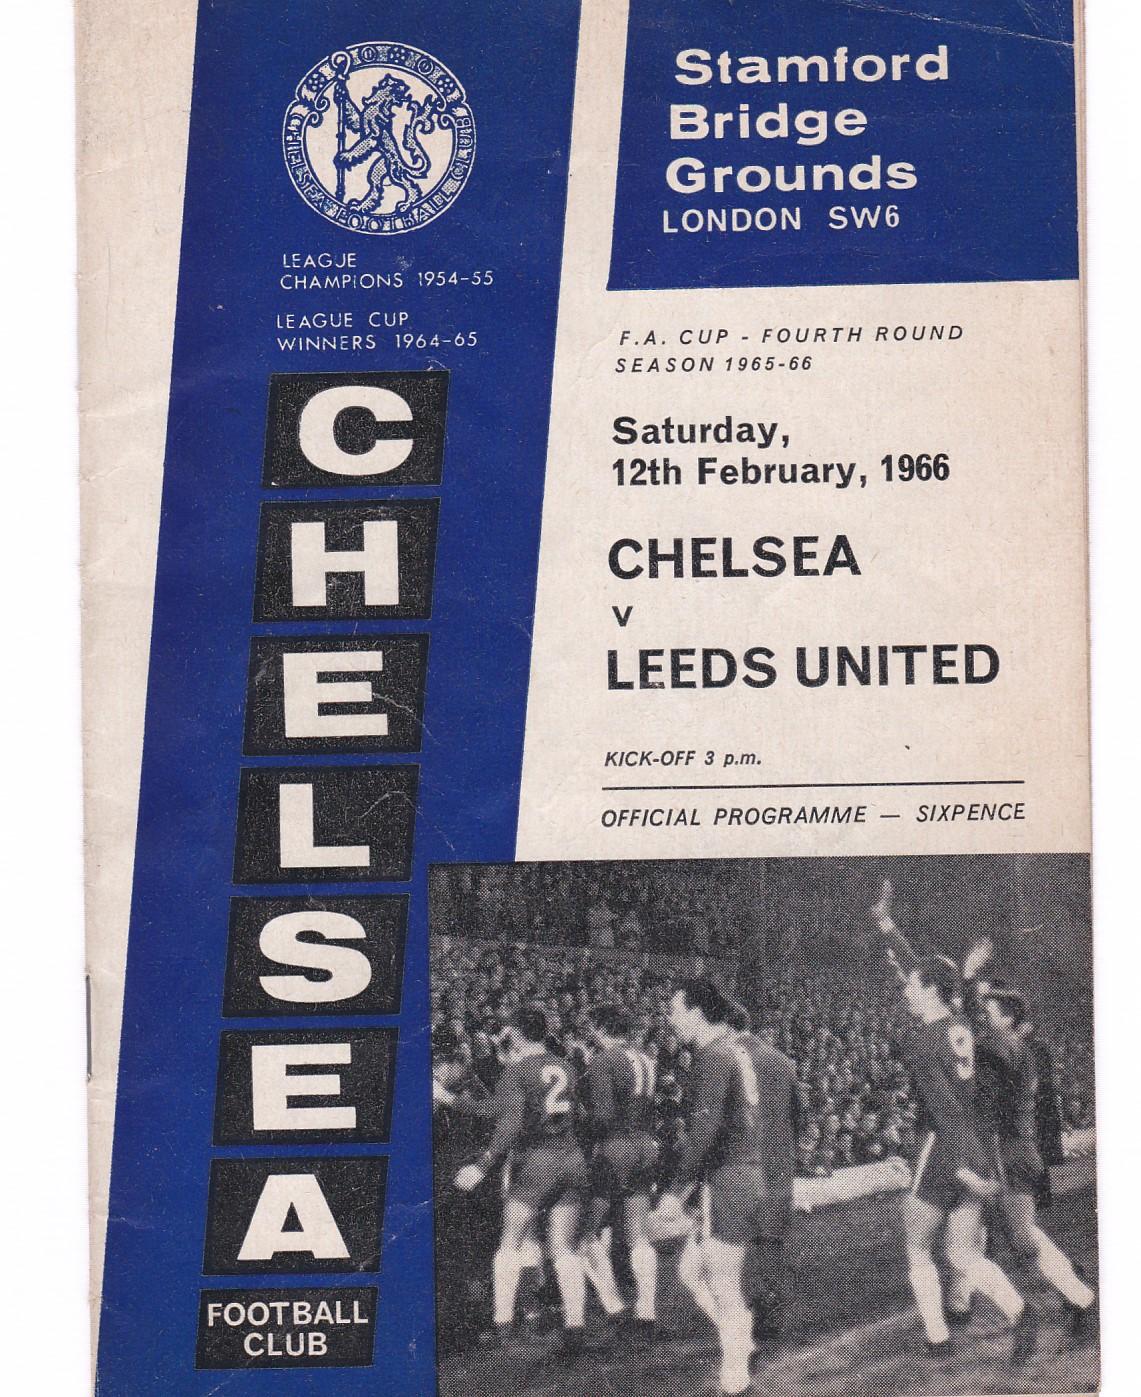 Chelsea v Leeds United 1966 February 12th FA Cup Fourth Round